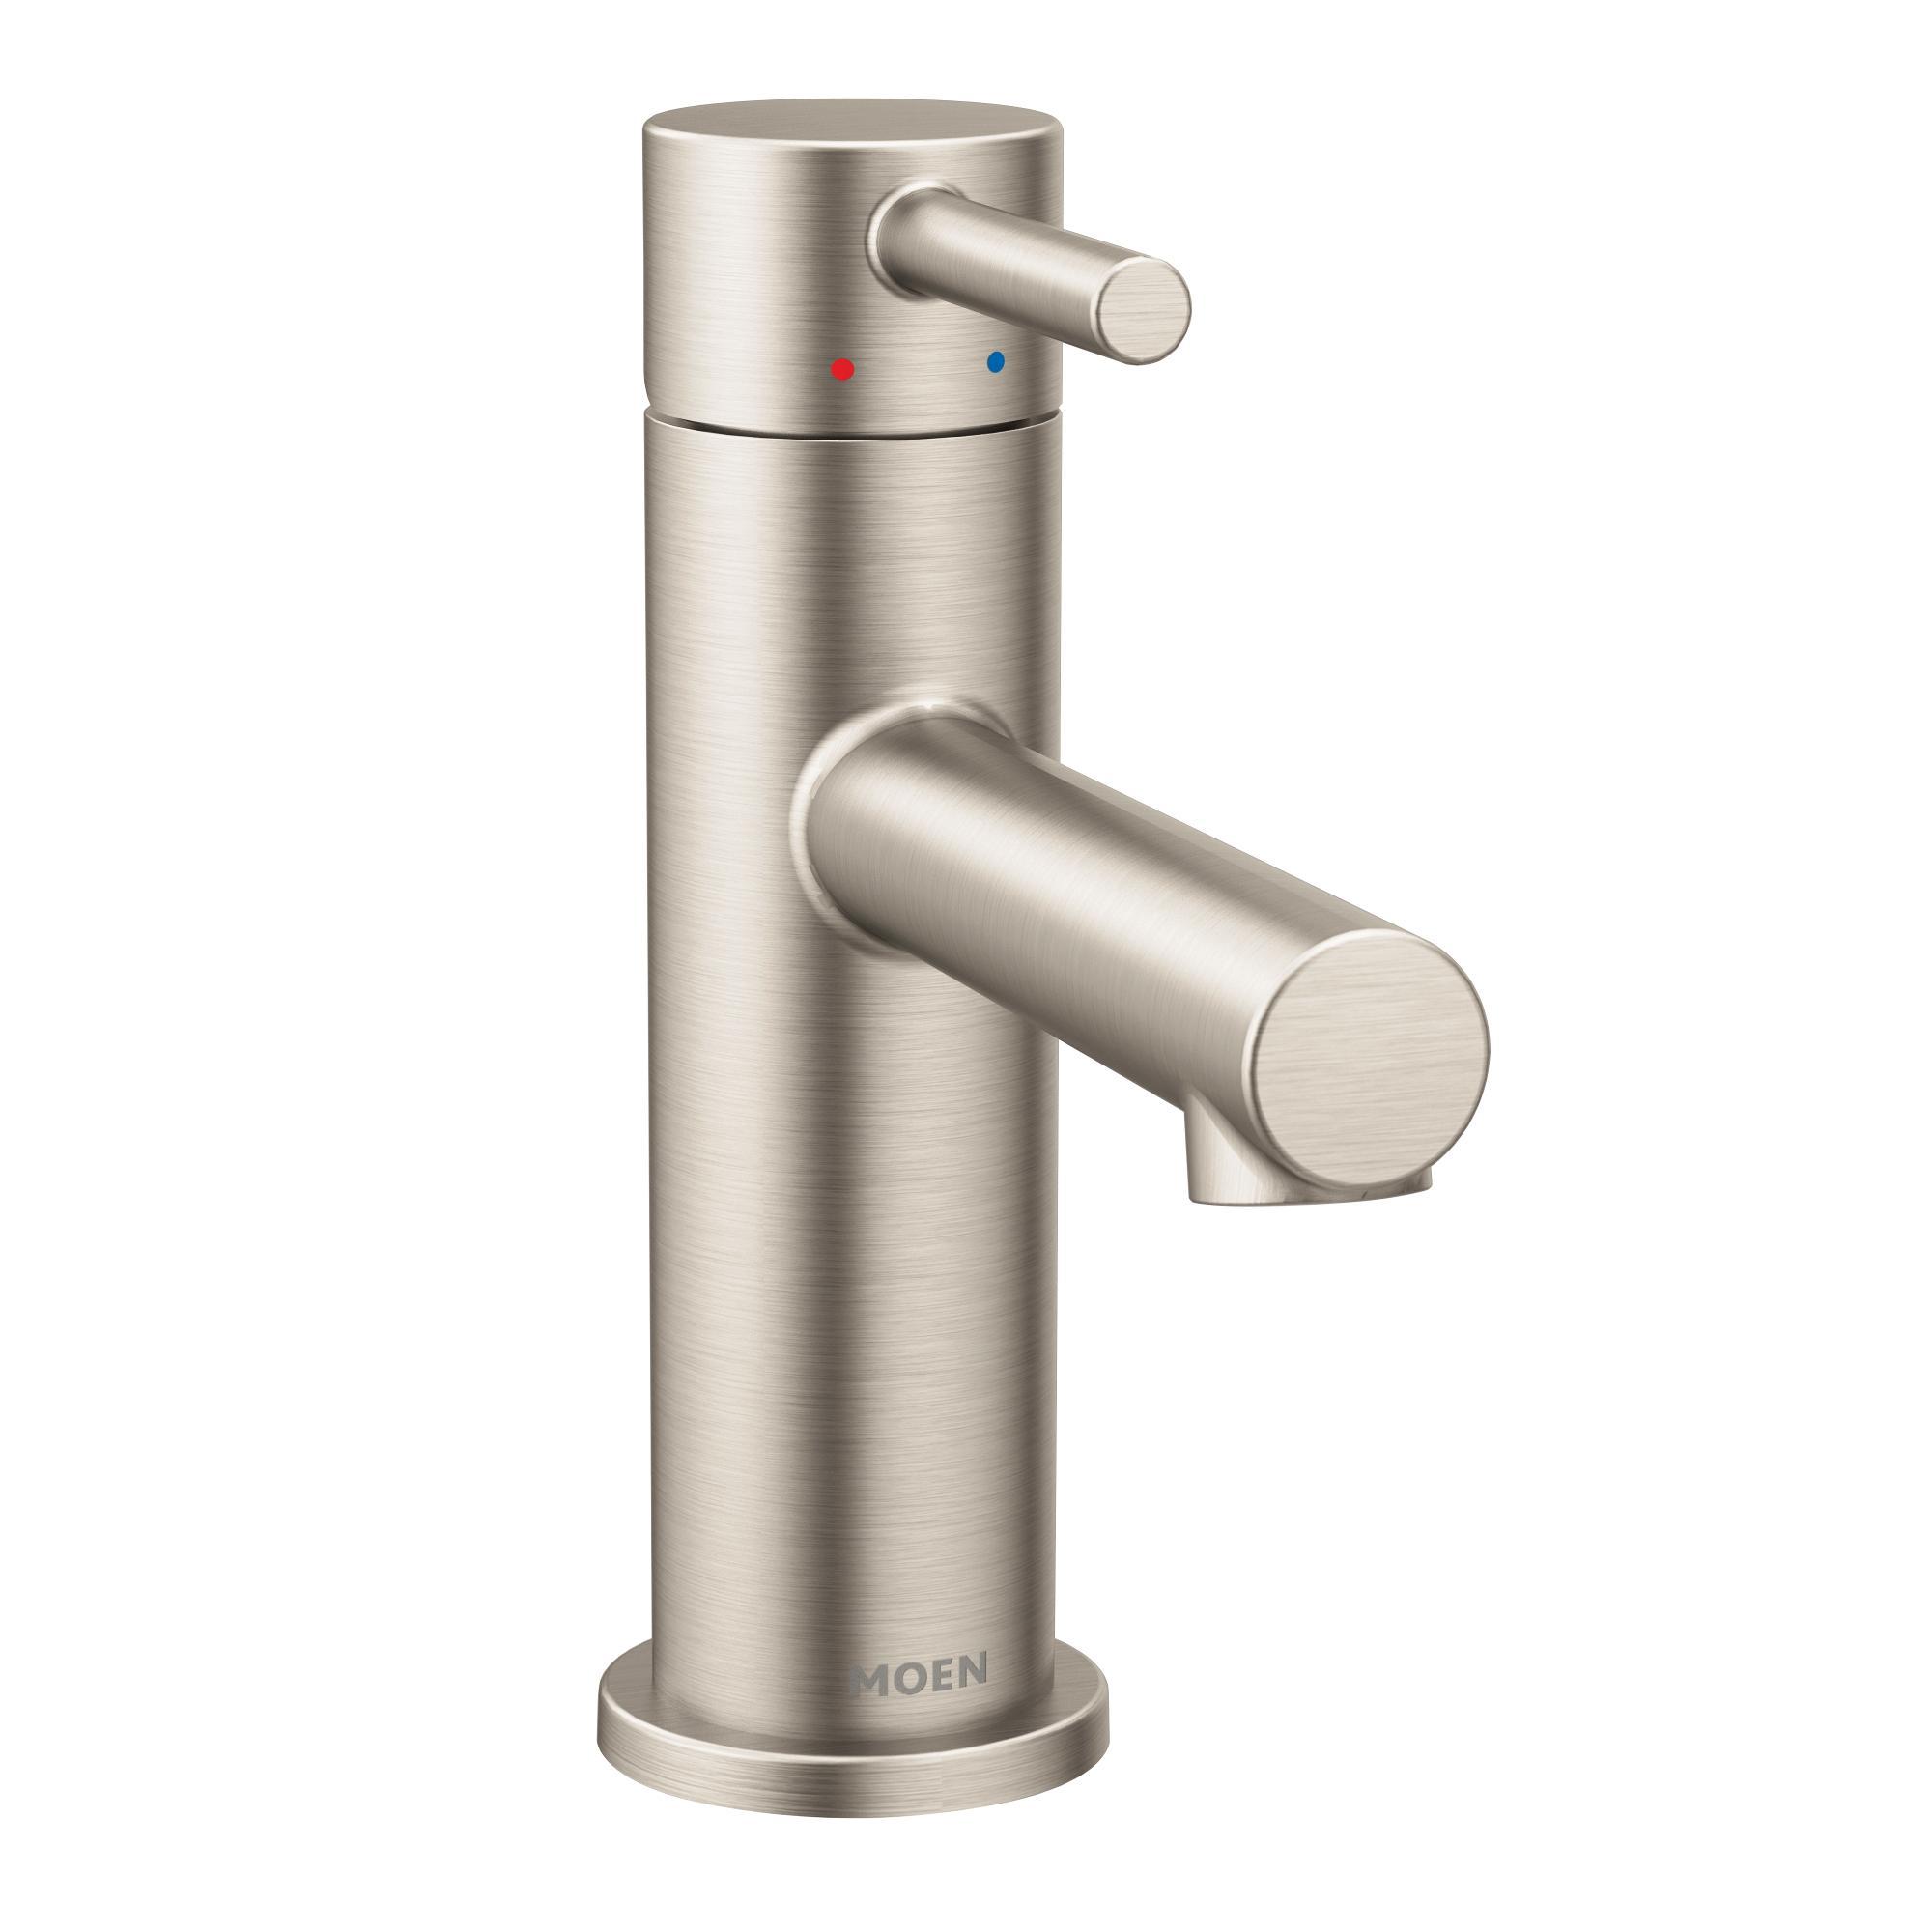 Moen 6190bn Align One Handle High Arc Bathroom Faucet With